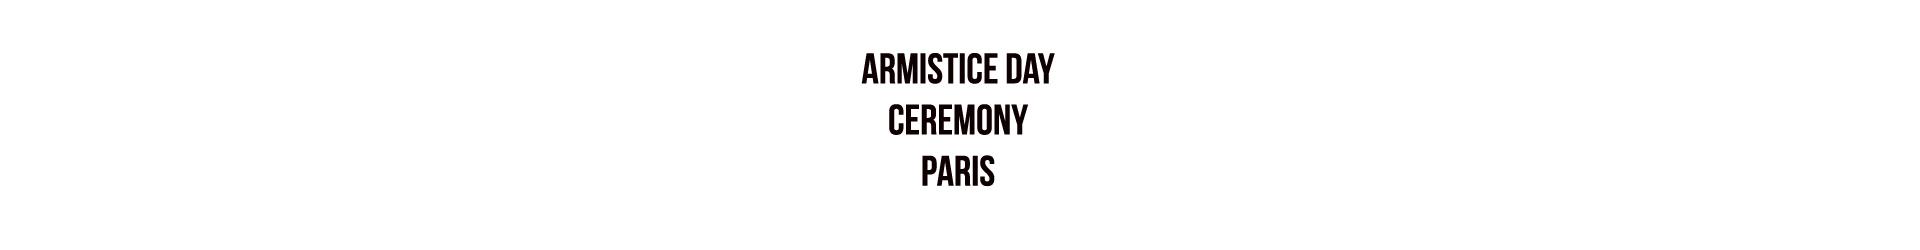 Armistice Day Ceremony Paris – Sunday, 11 November, 2018